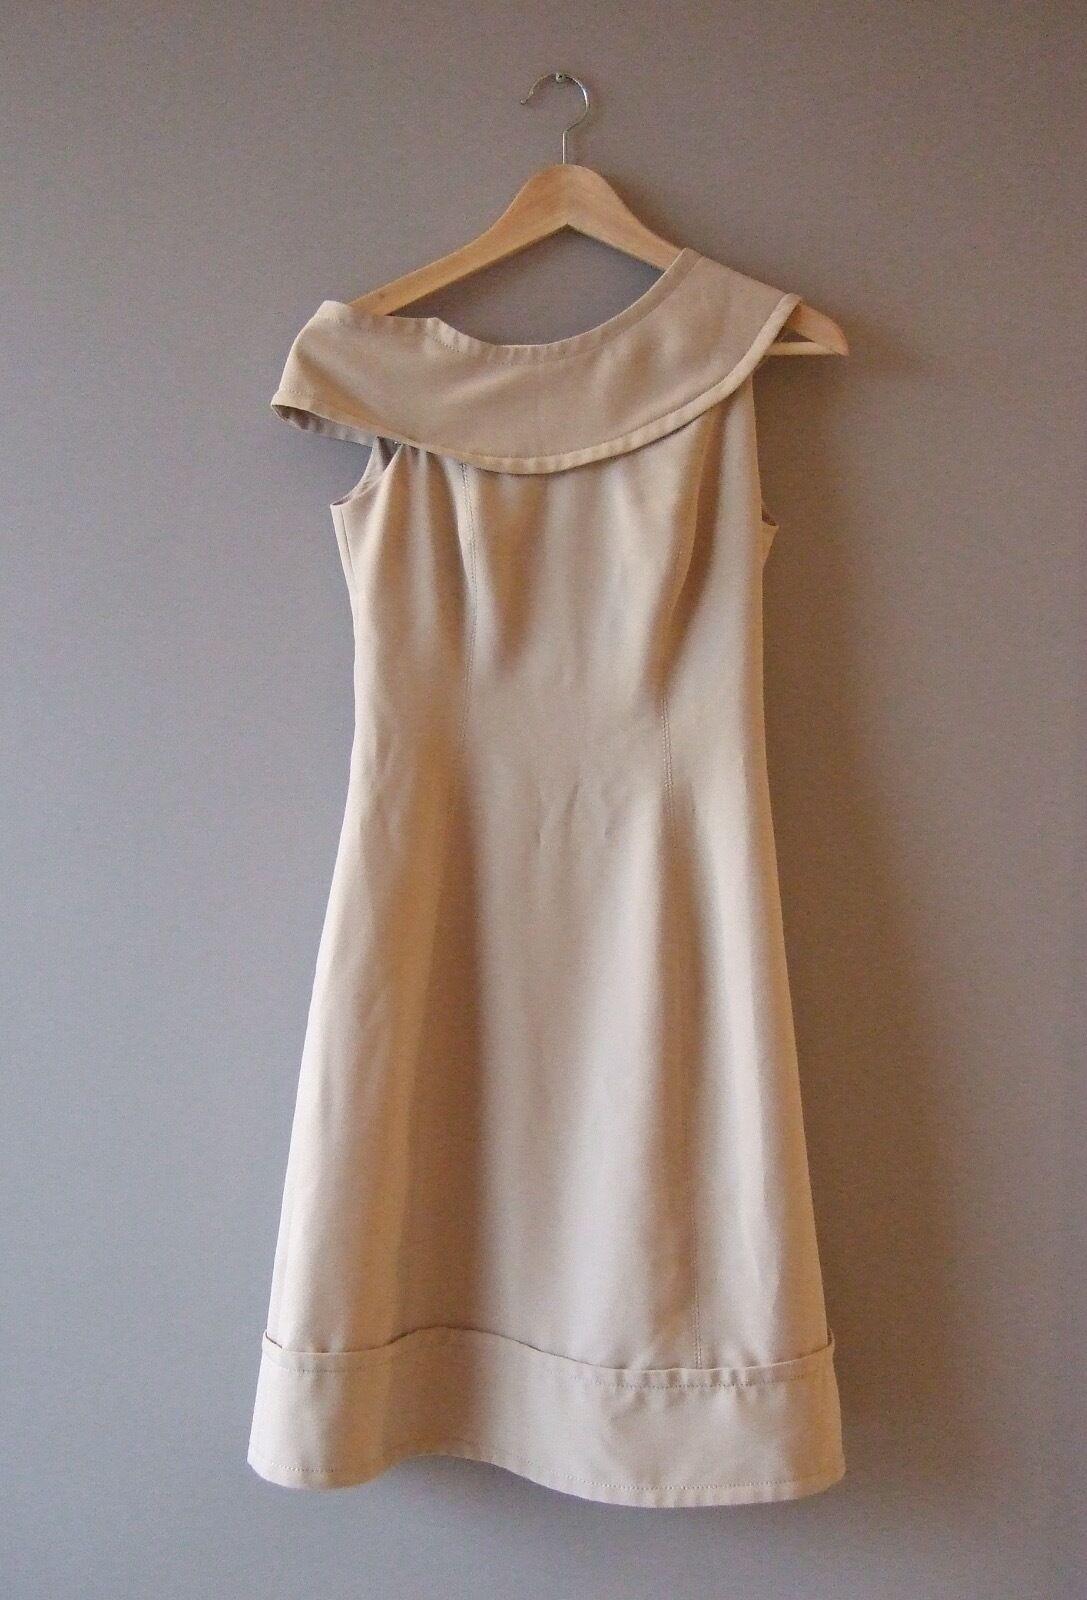 Gorgeous Designer Adolfo Dominguez Beige Dress Size EU36 UK8 RRP 320